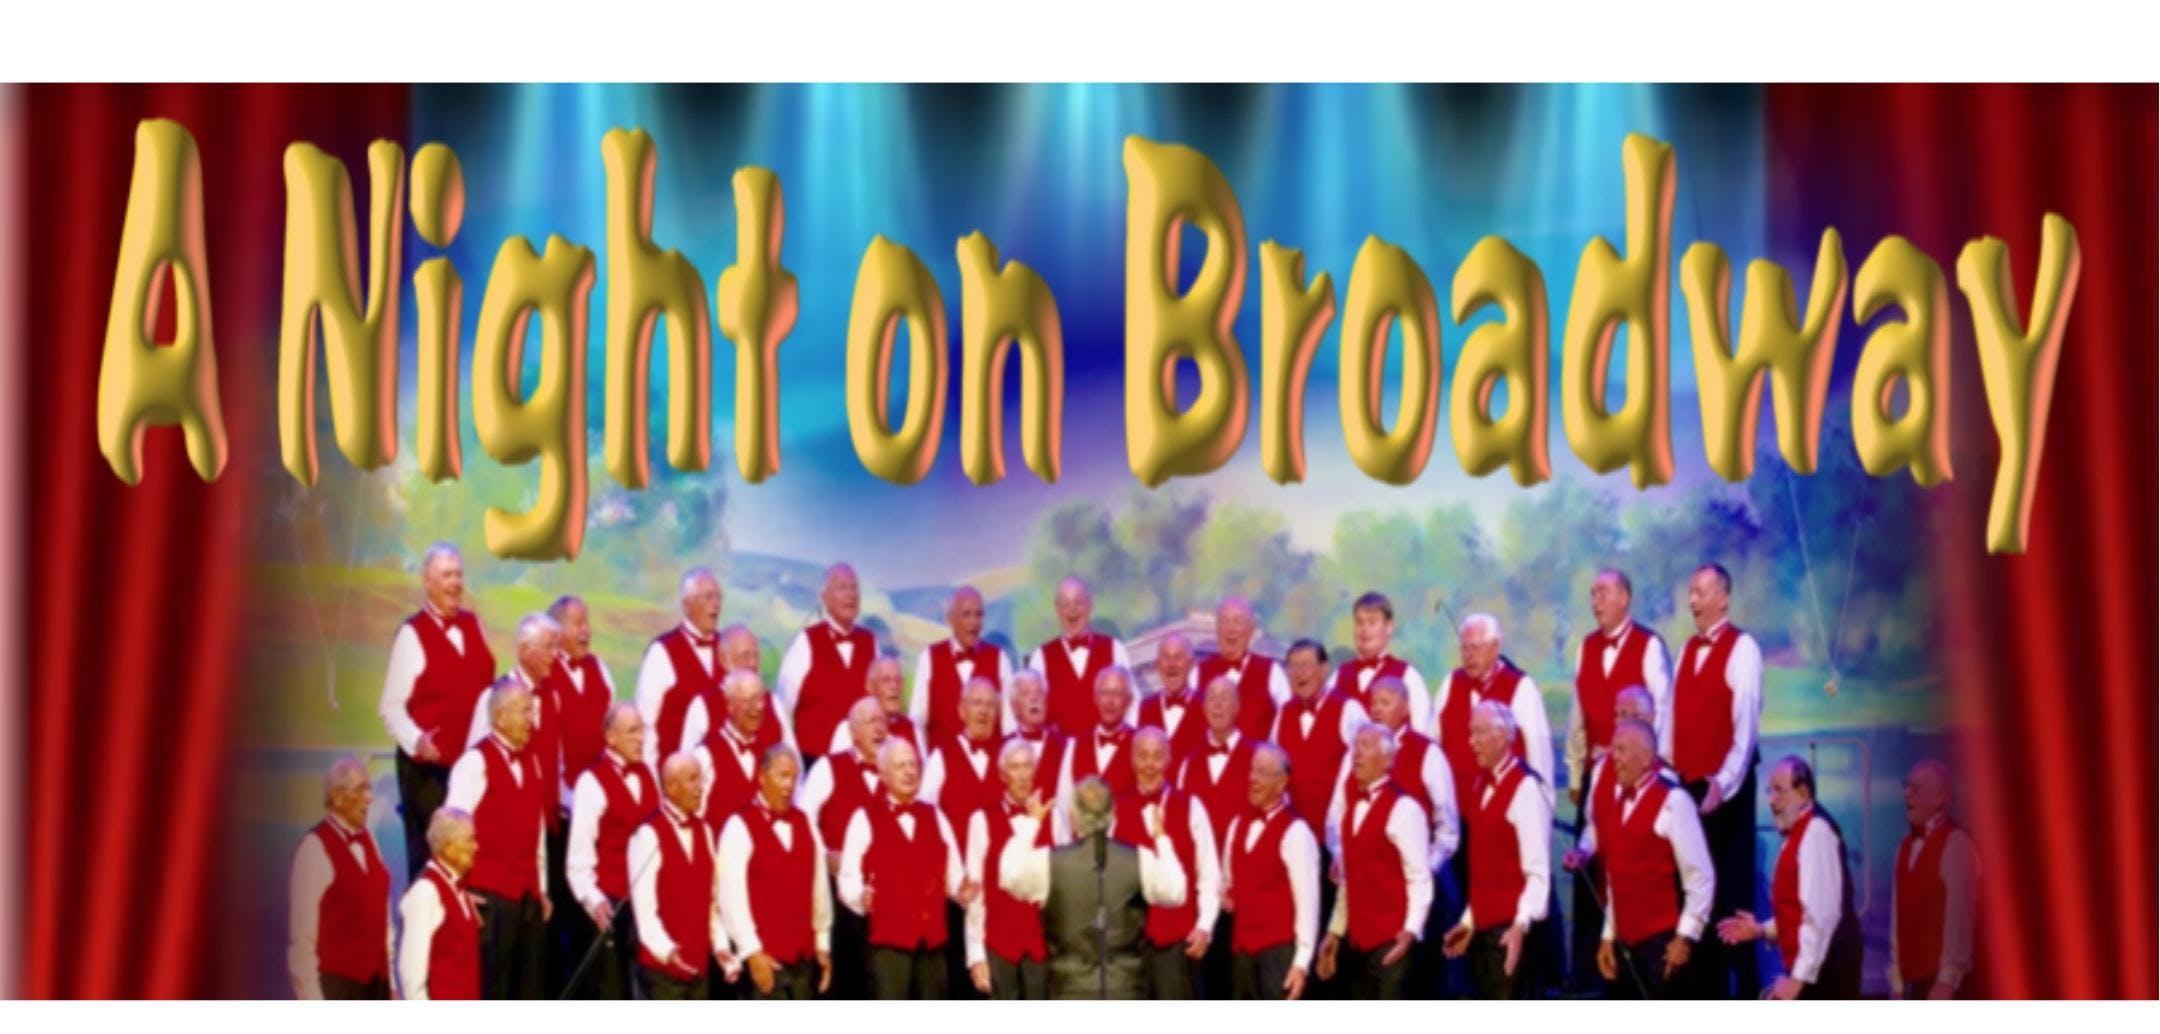 Barbershop Chorus Annual Show - $20 ($18 ten